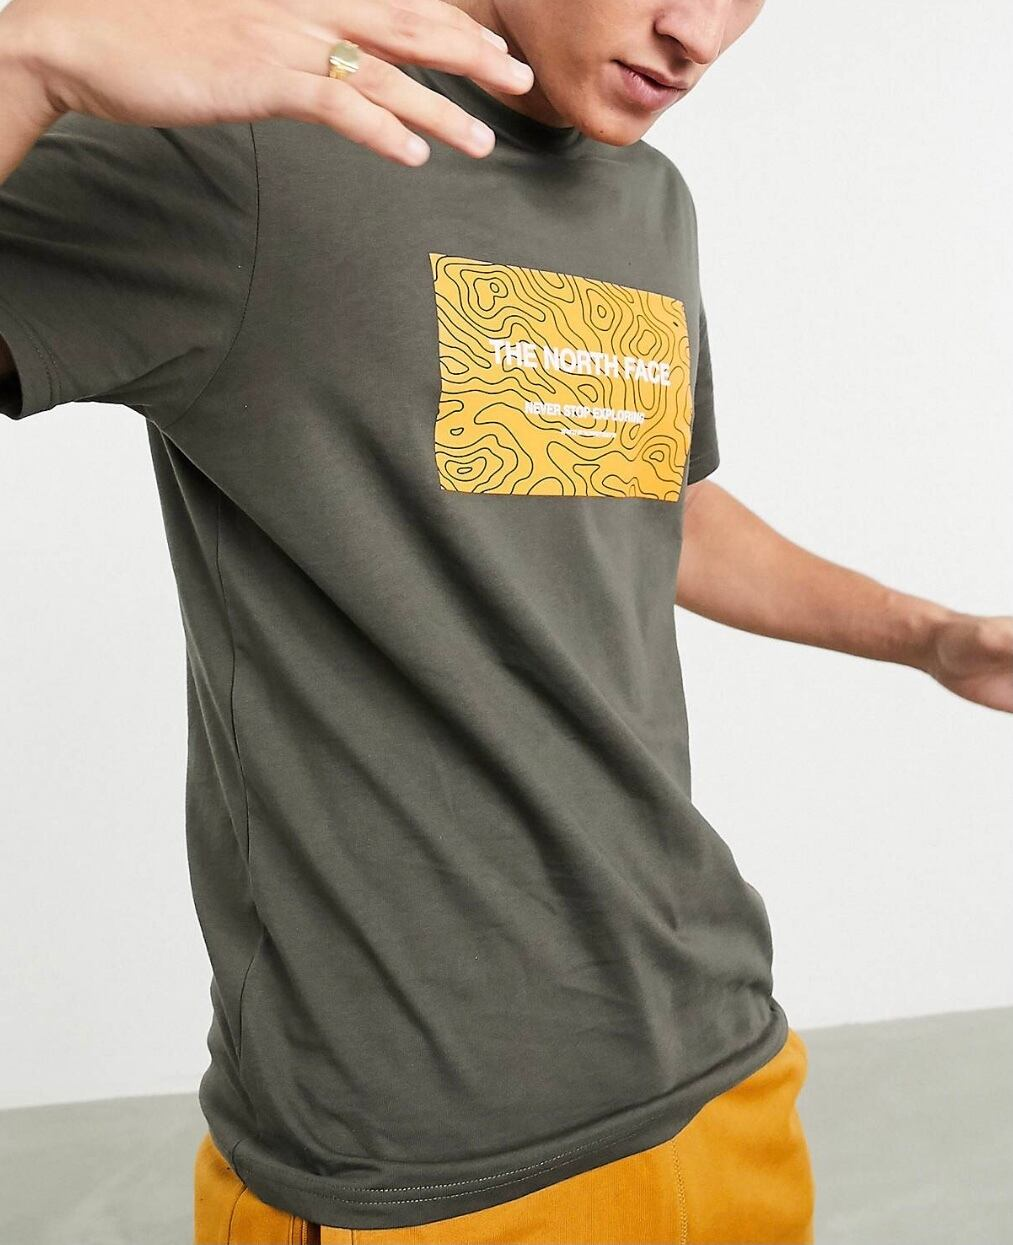 TNF Topo Box t-shirt / chacol gray